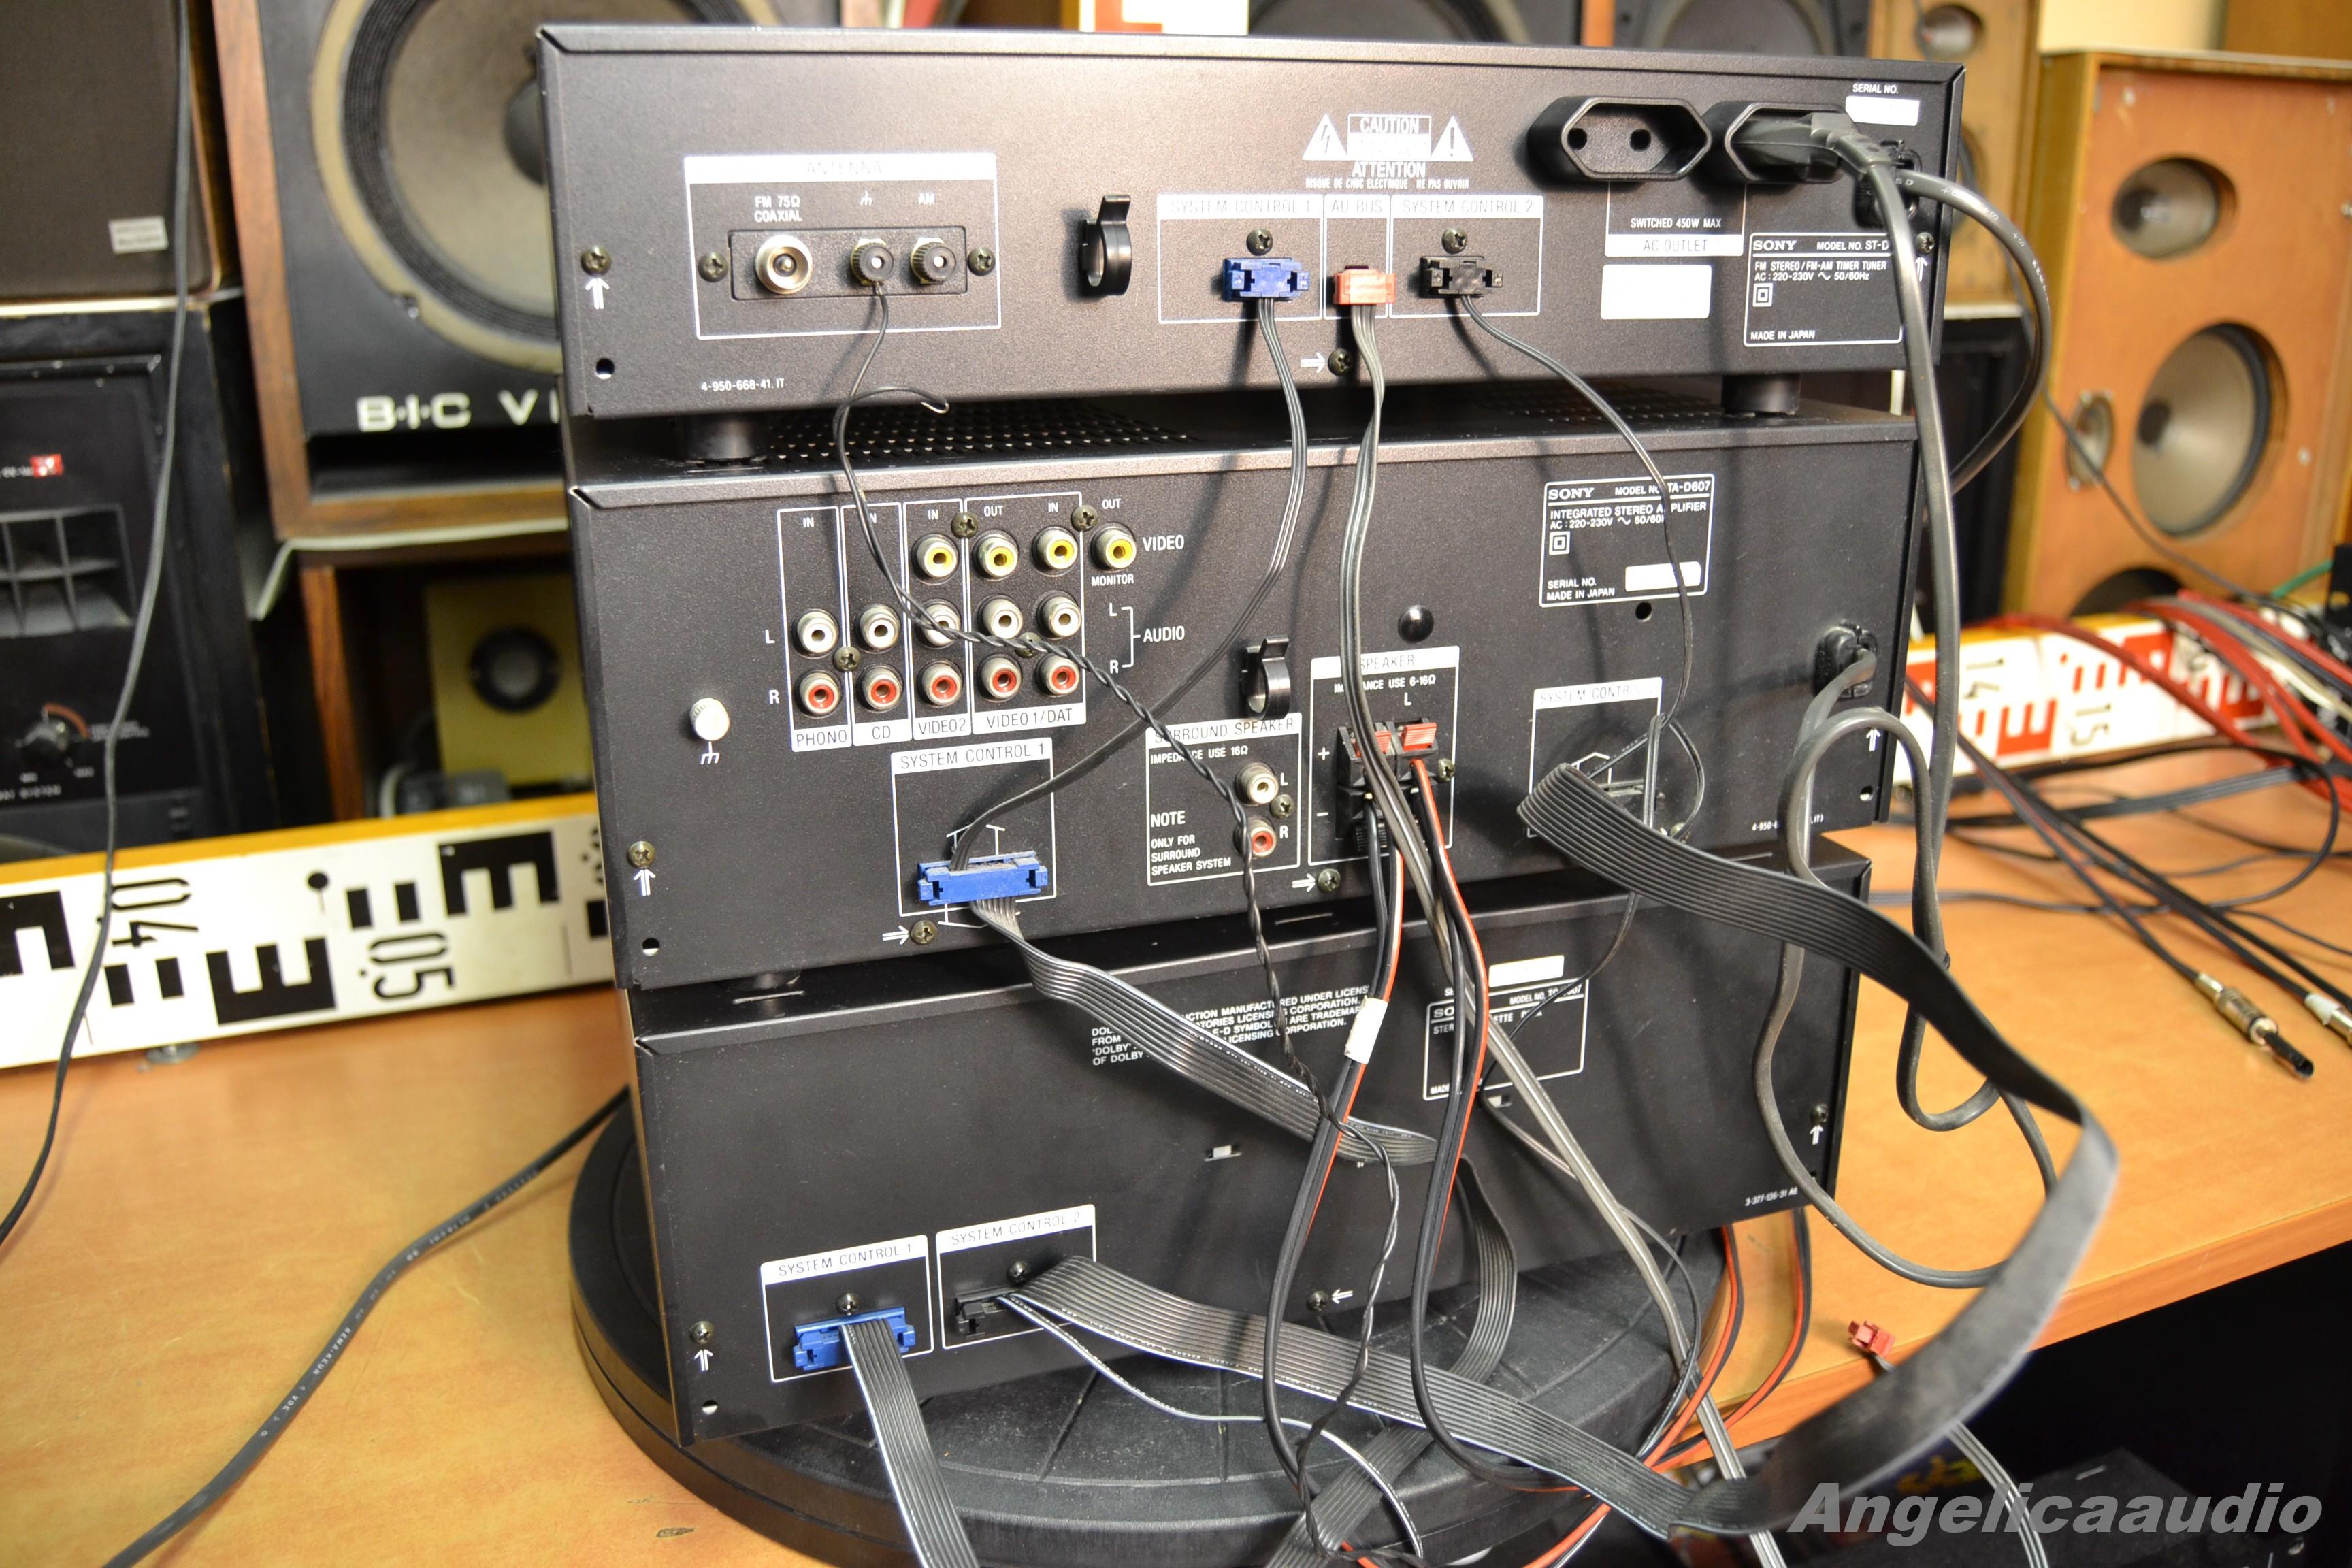 Sony Lbt D507 Sony St D707 Ta D607 Tc D607 Made In